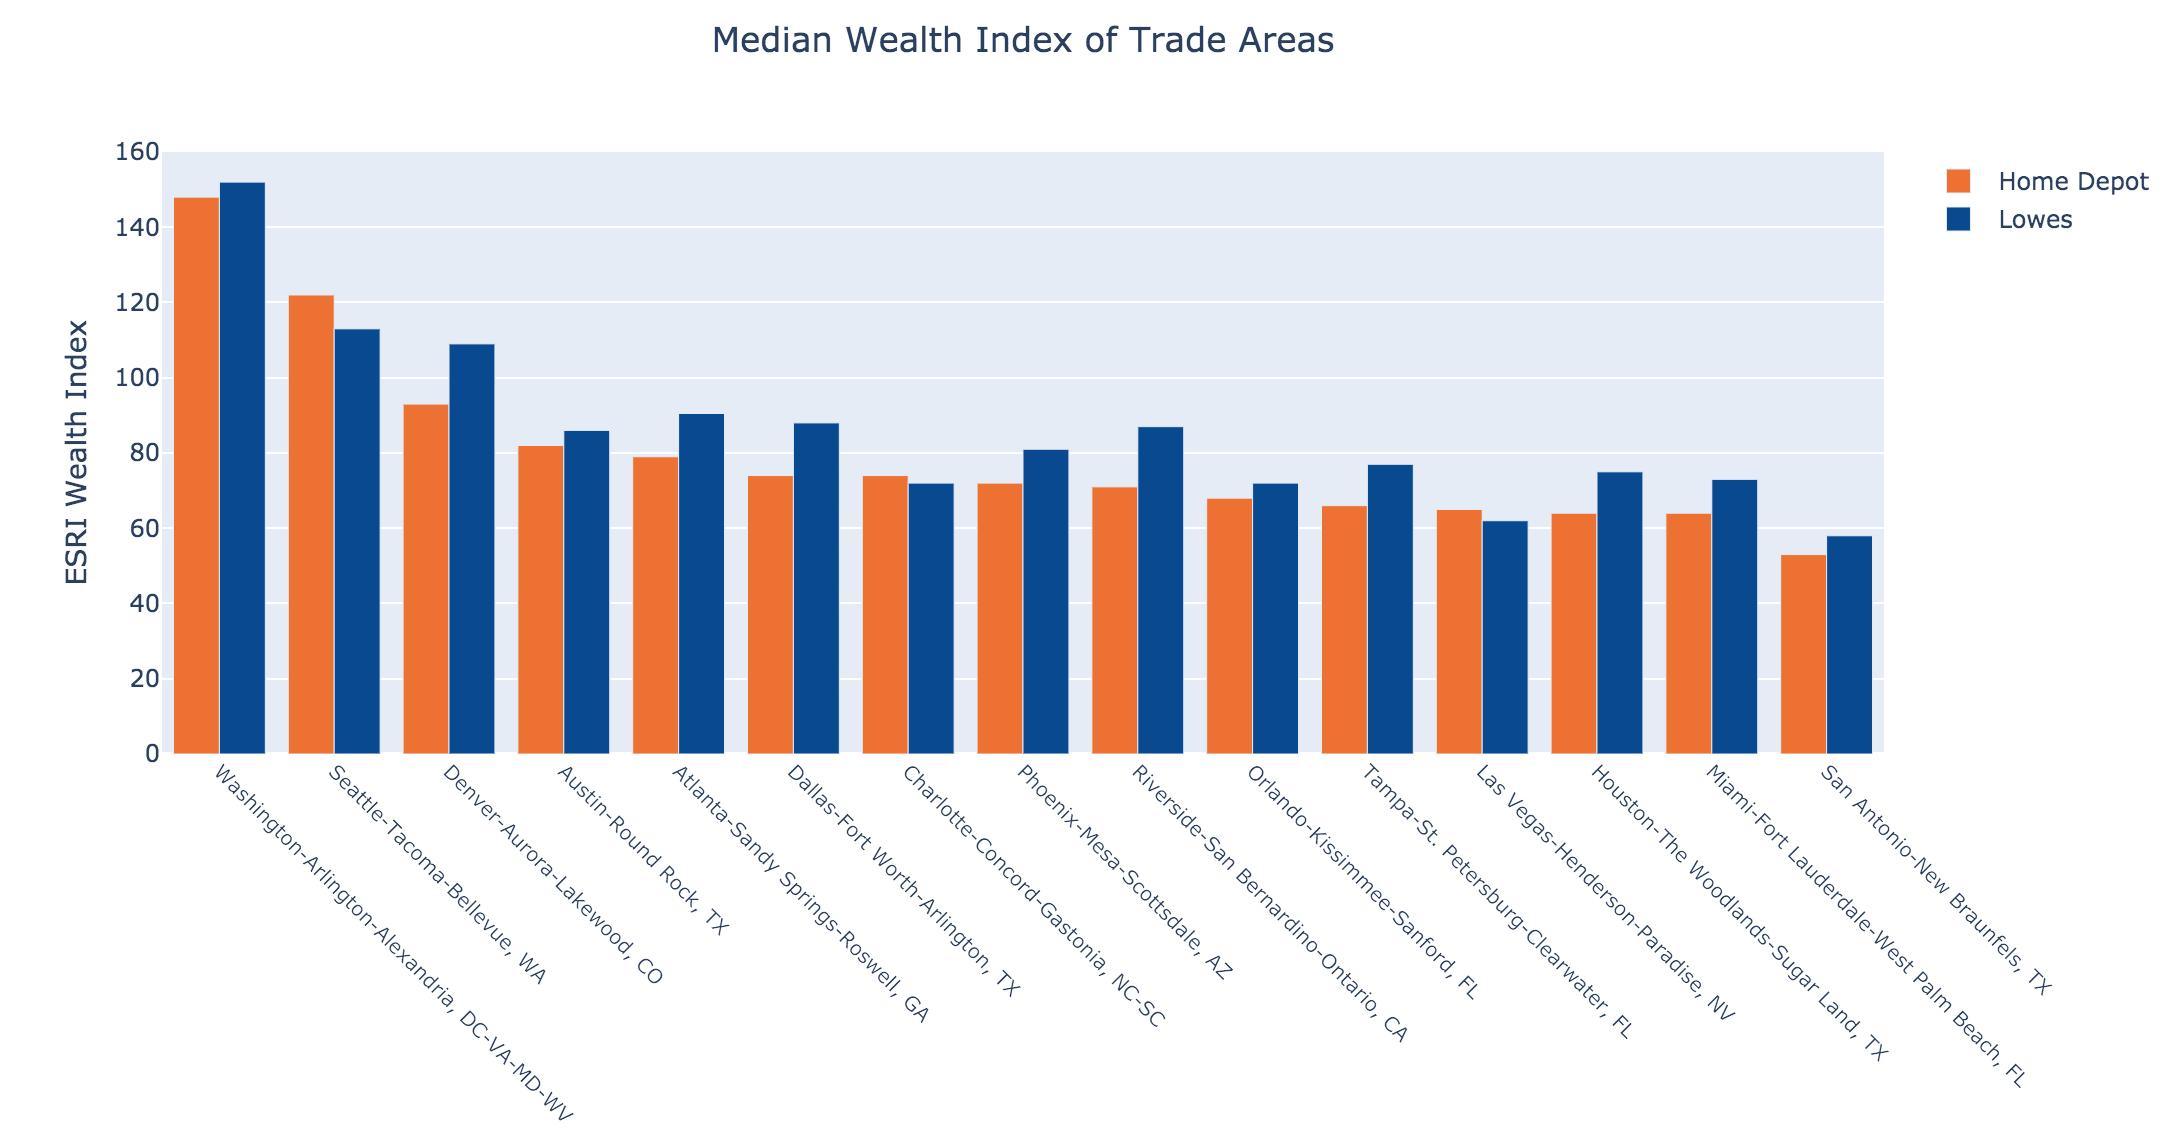 Median Wealth Index per Trade Area